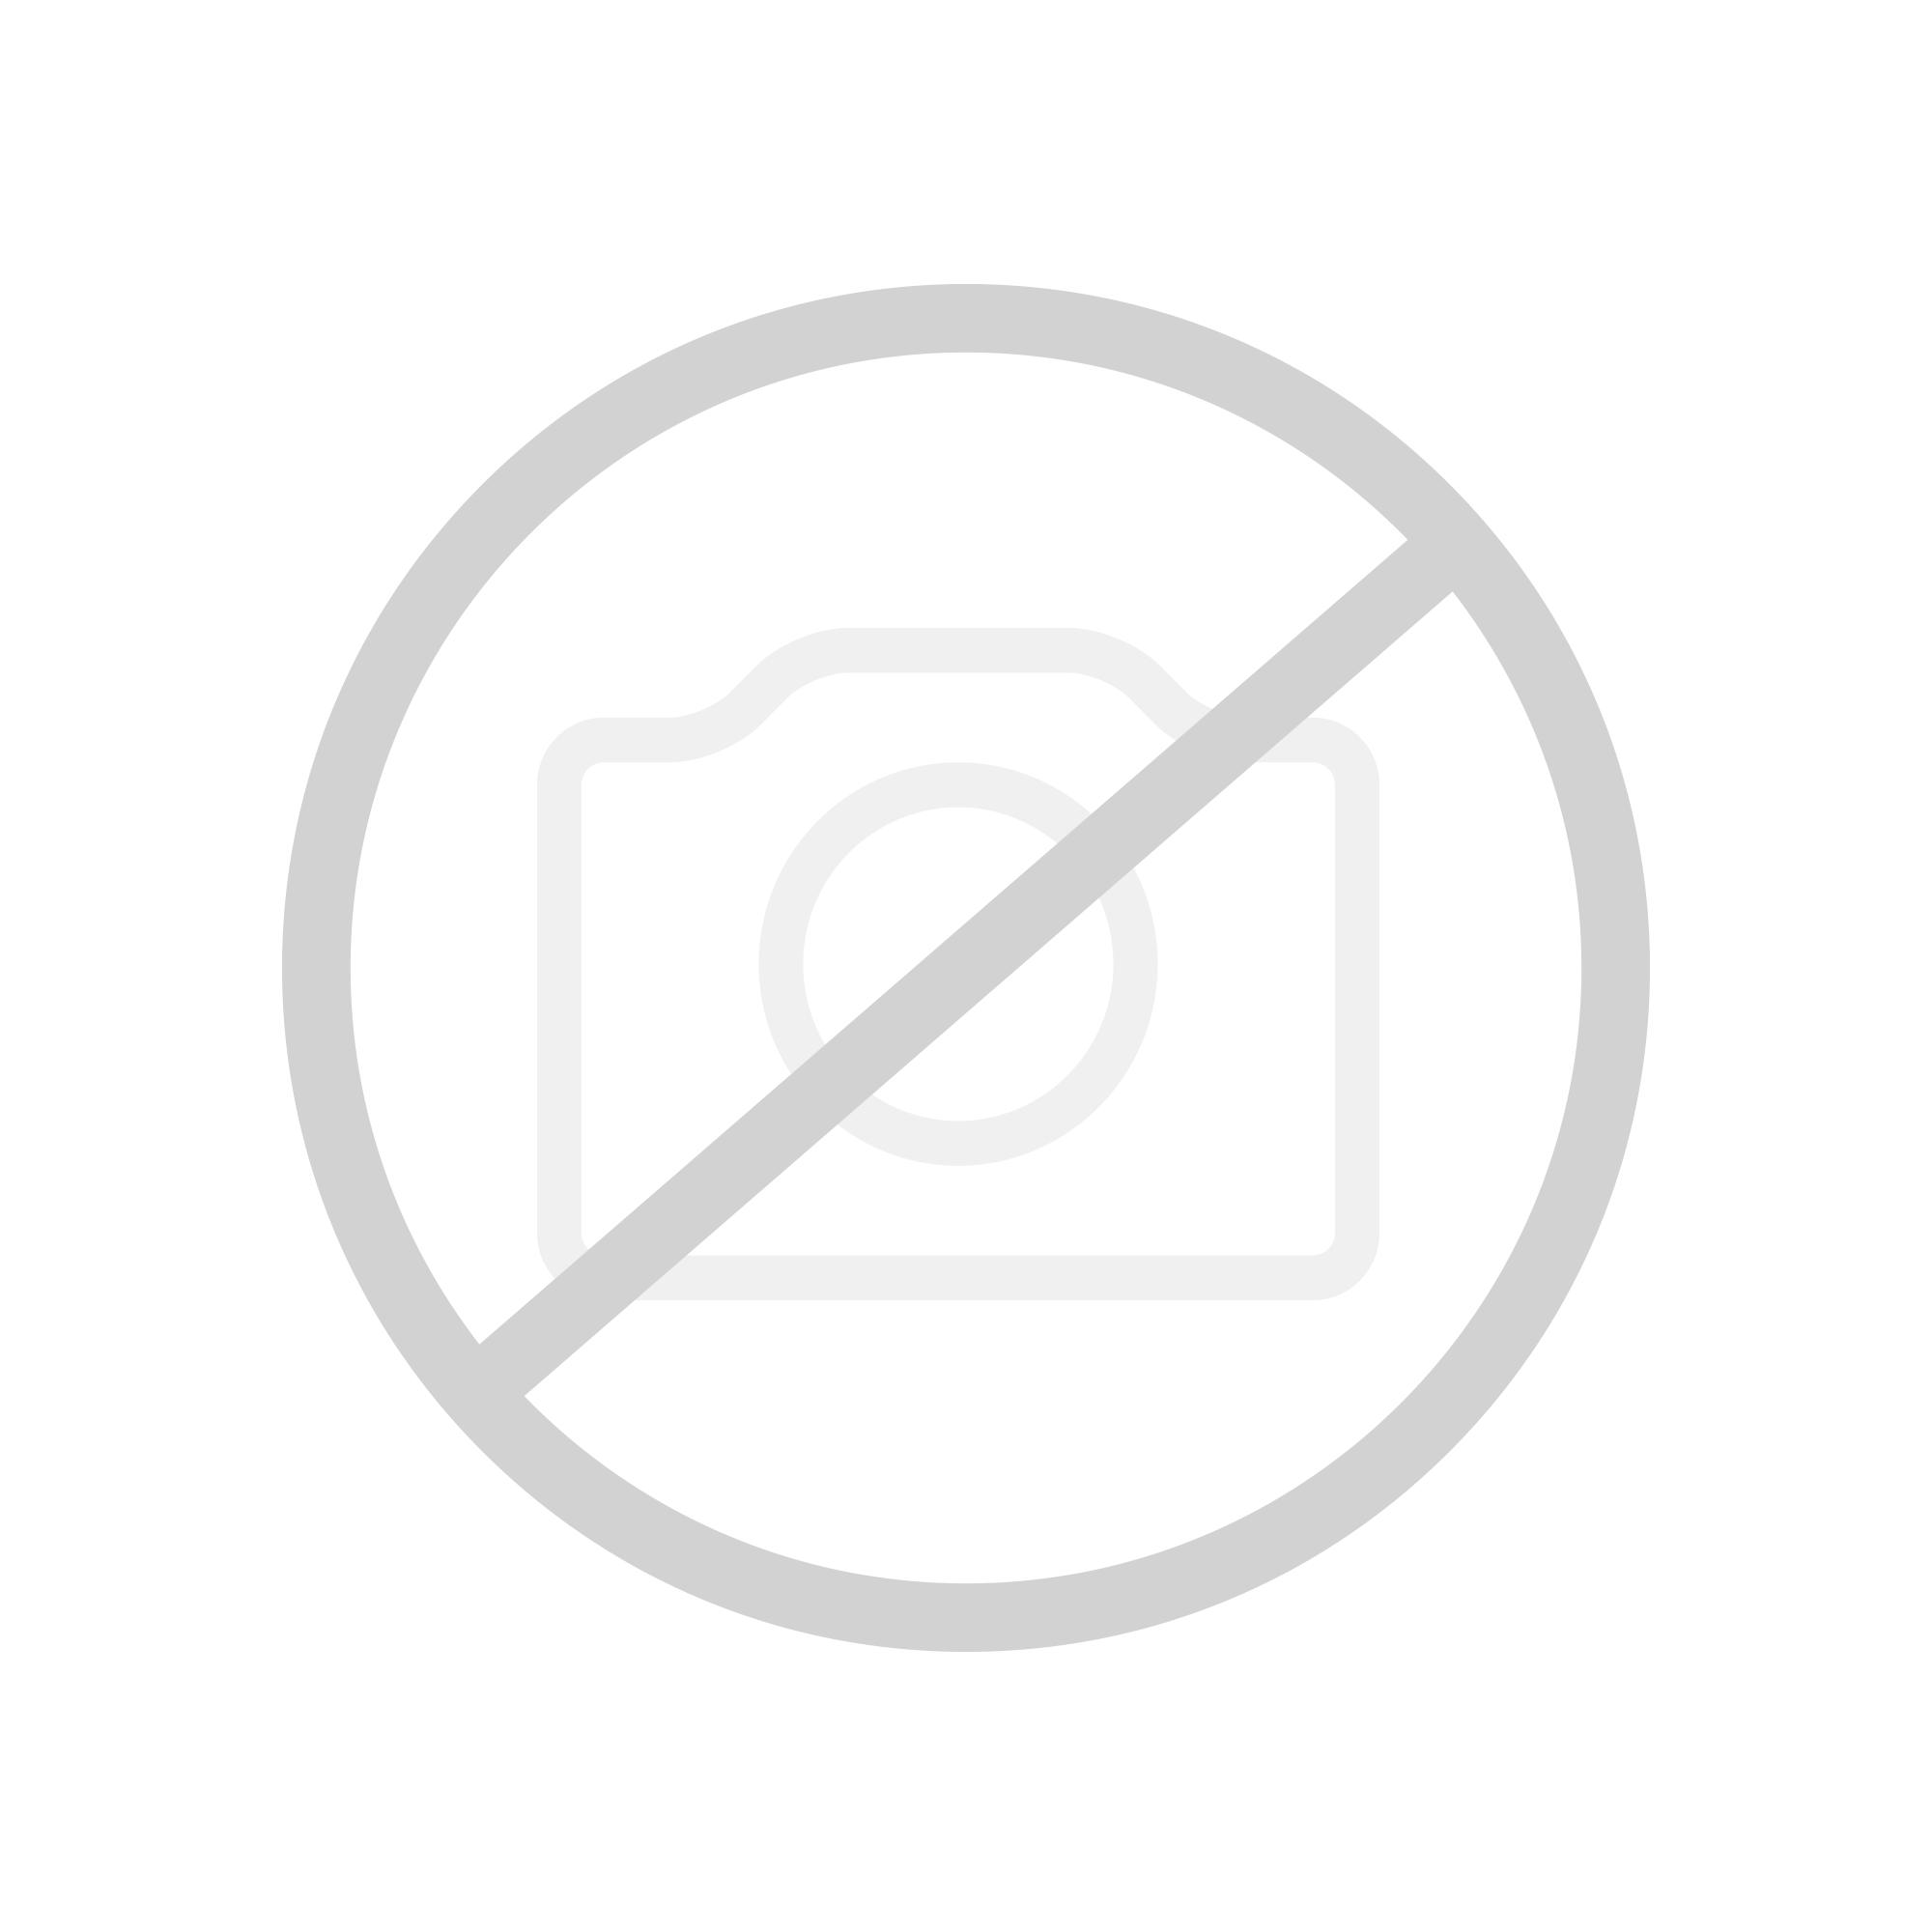 Kaldewei Dezent Opulenz Avantgarde Kollektion Badewannengriff Typ C